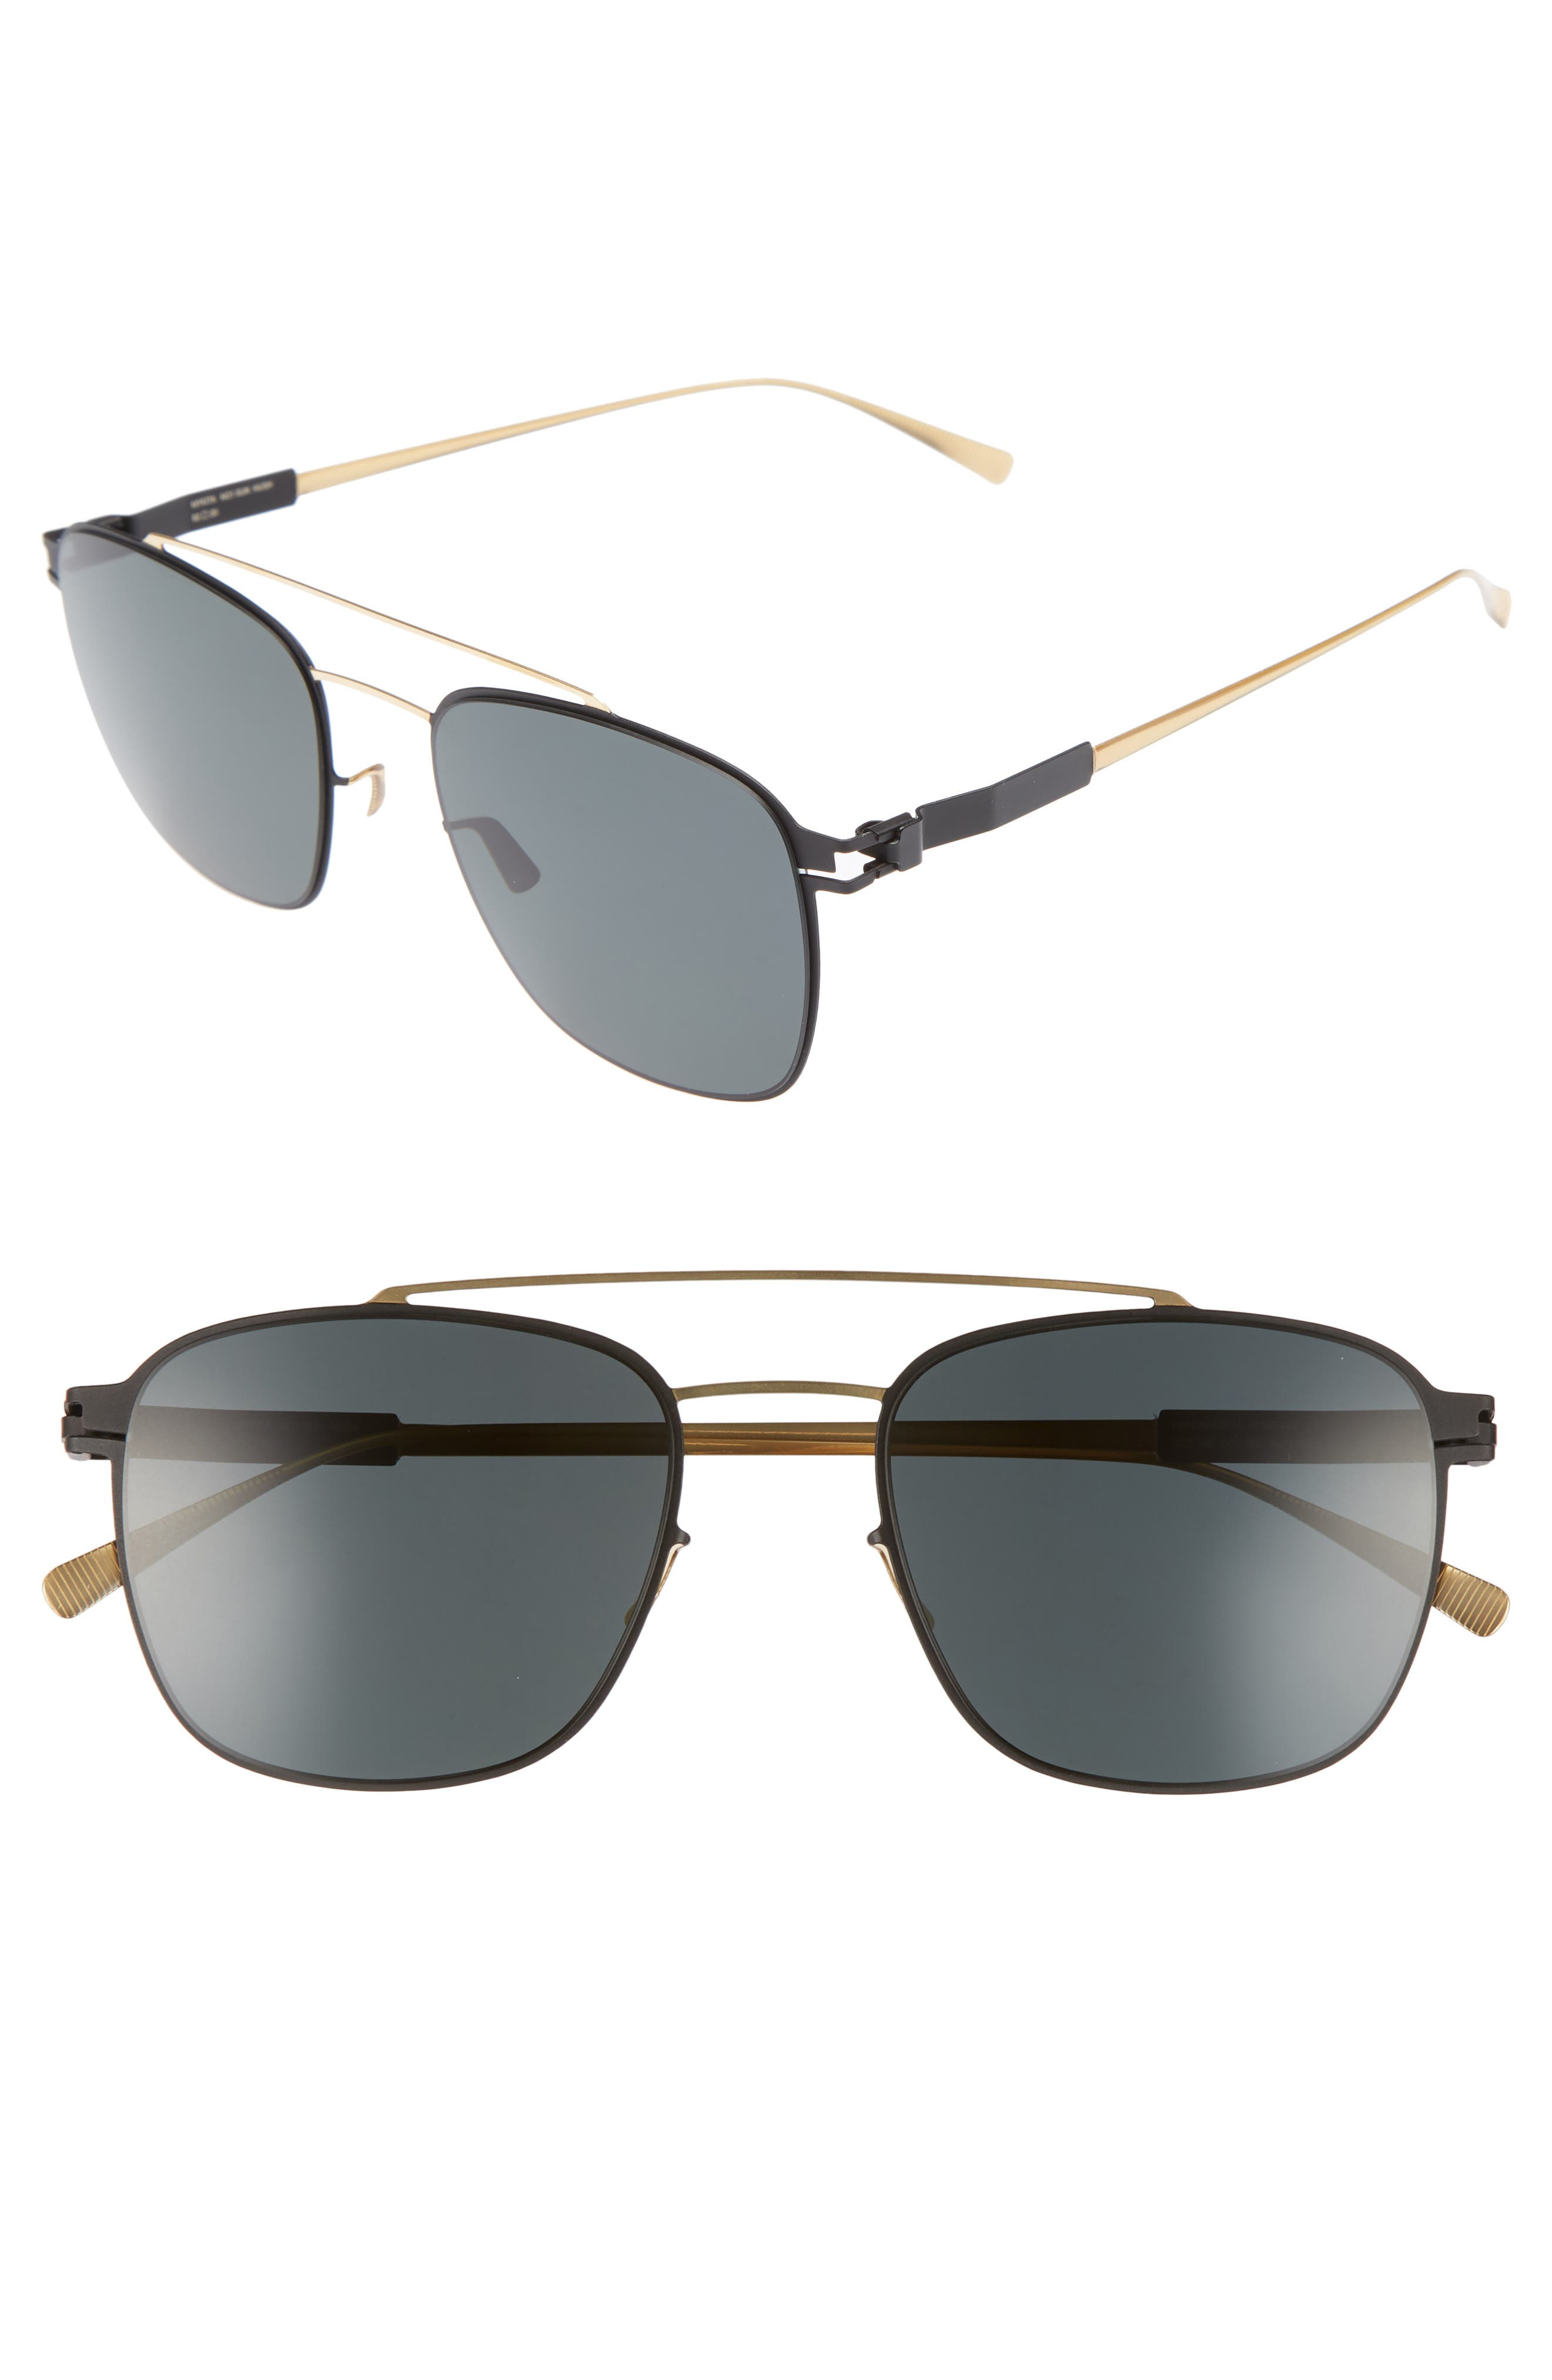 Hugh 52mm Polarized Sunglasses,                         Main,                         color, Gold/ Black